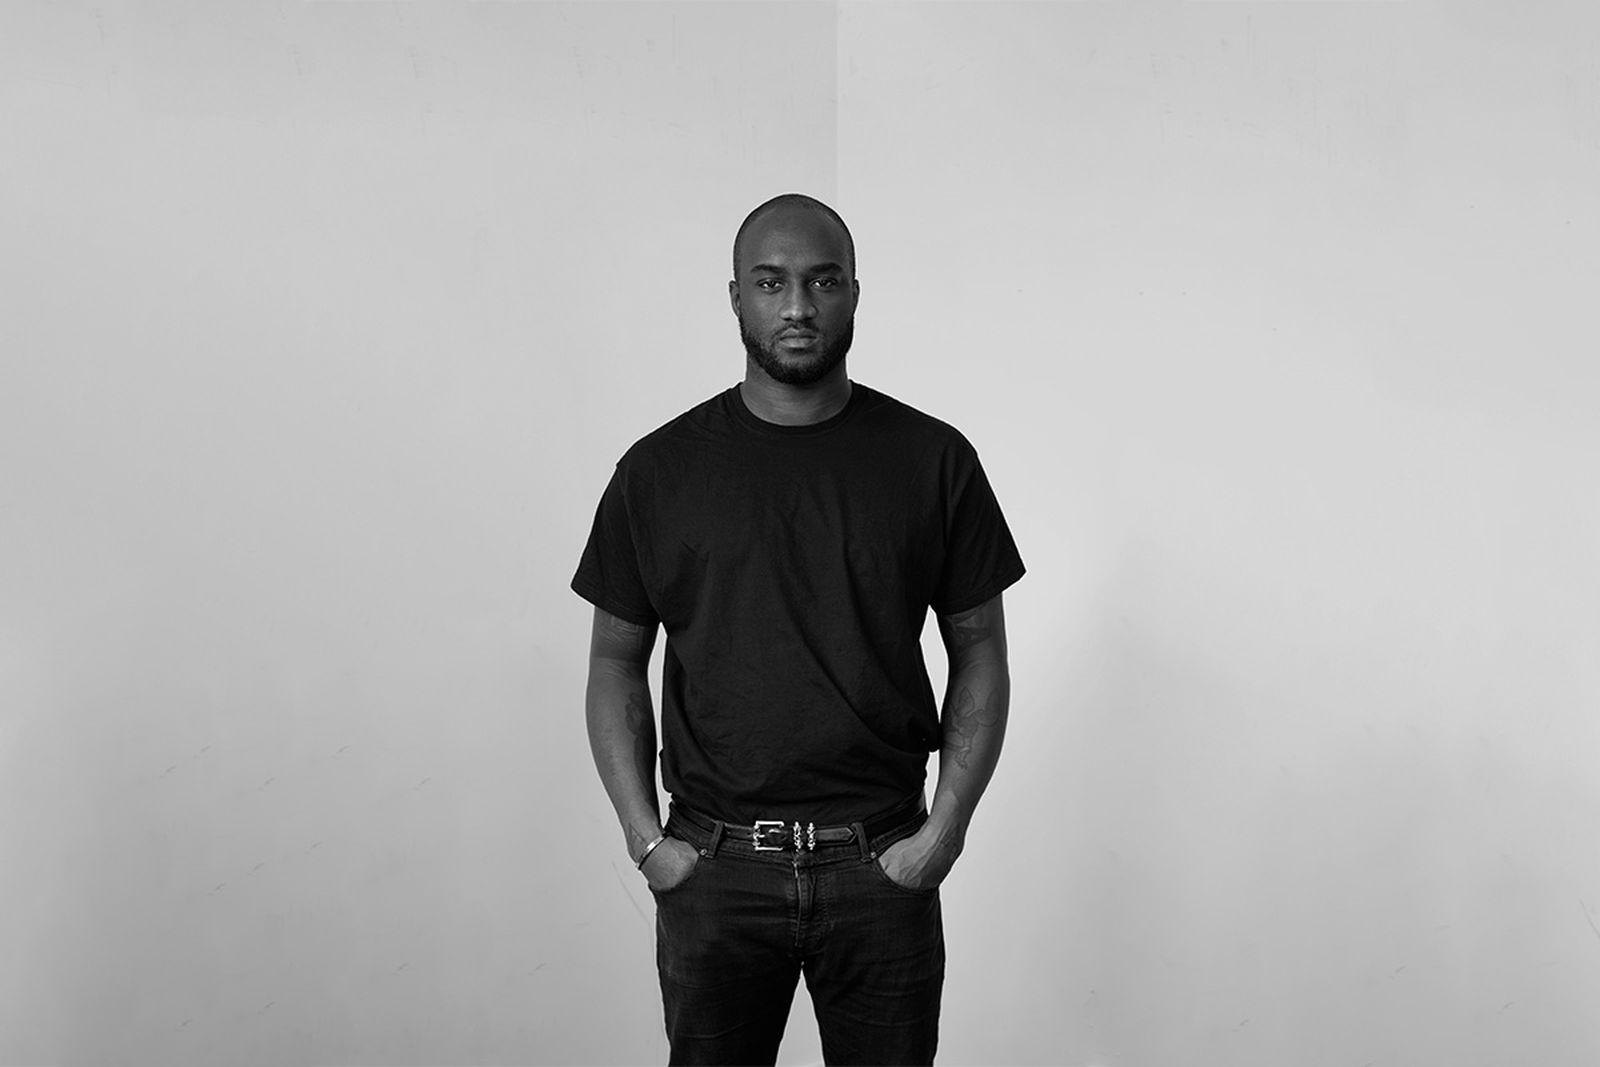 pioneer dj co virgil abloh Figures of Speech OFF-WHITE c/o Virgil Abloh mca chicago